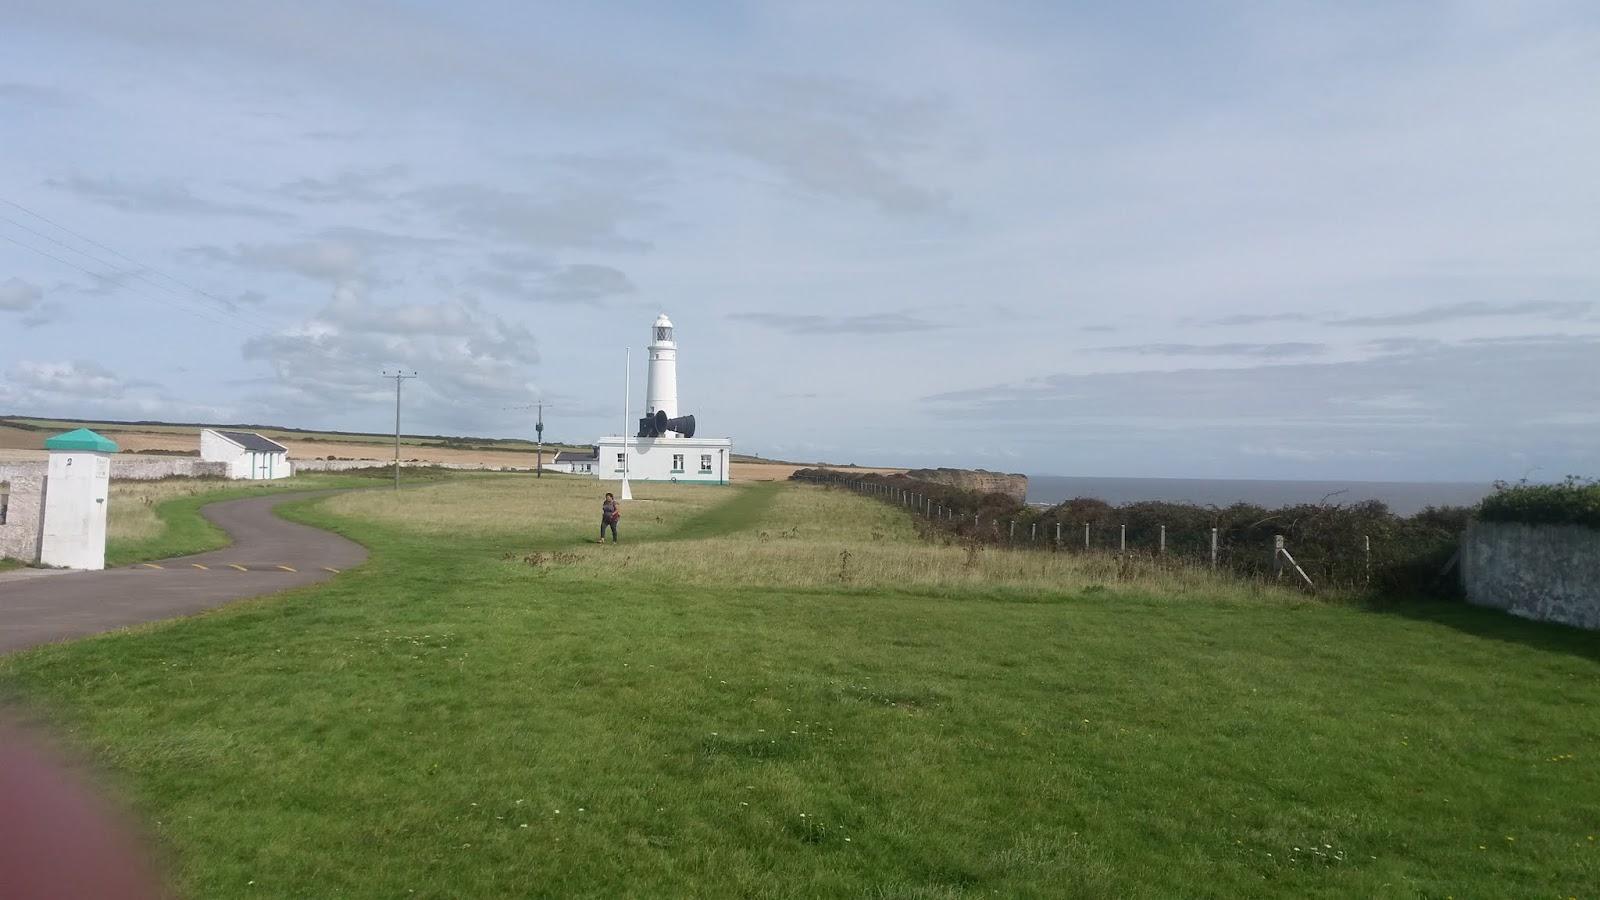 20170824 152150 Nash Point lighthouse